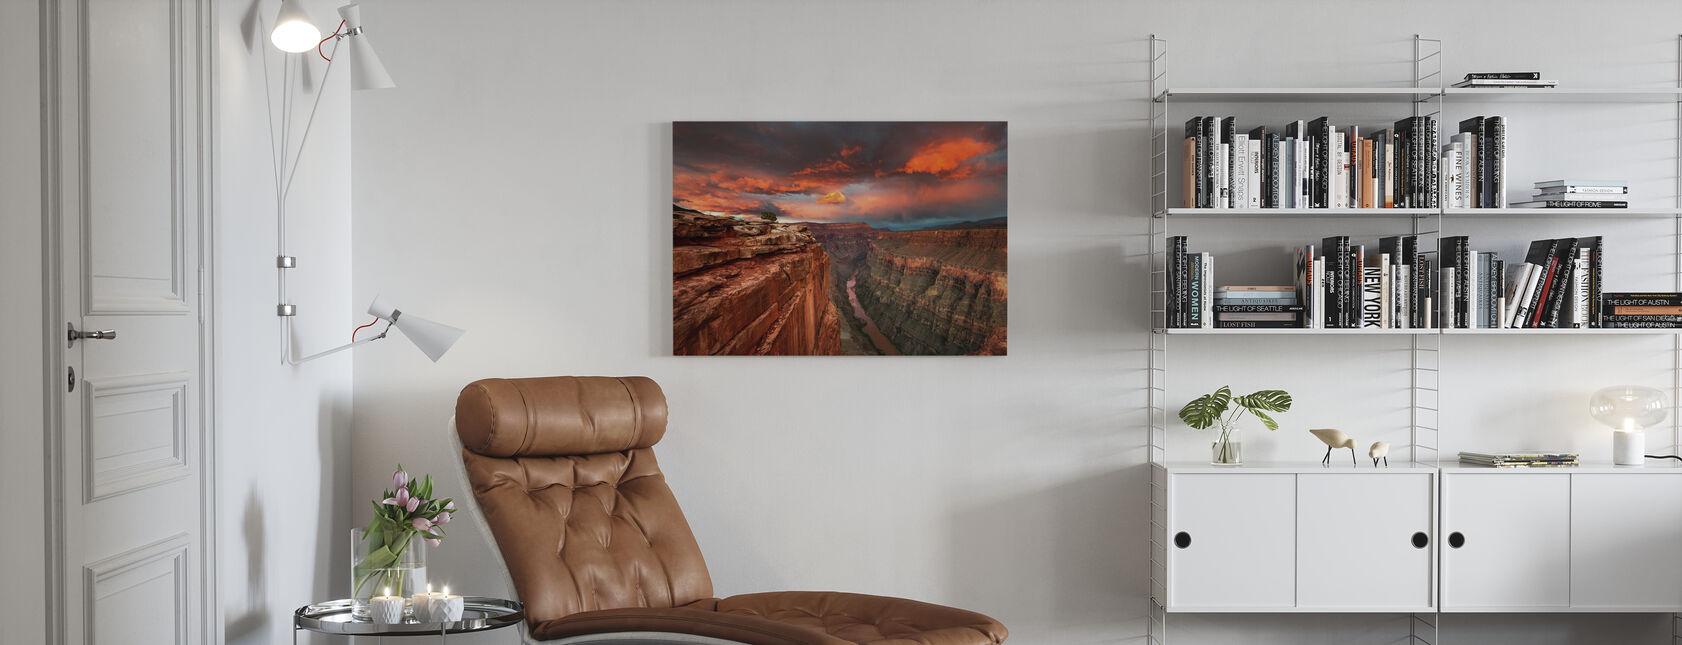 Redemption - Canvas print - Living Room